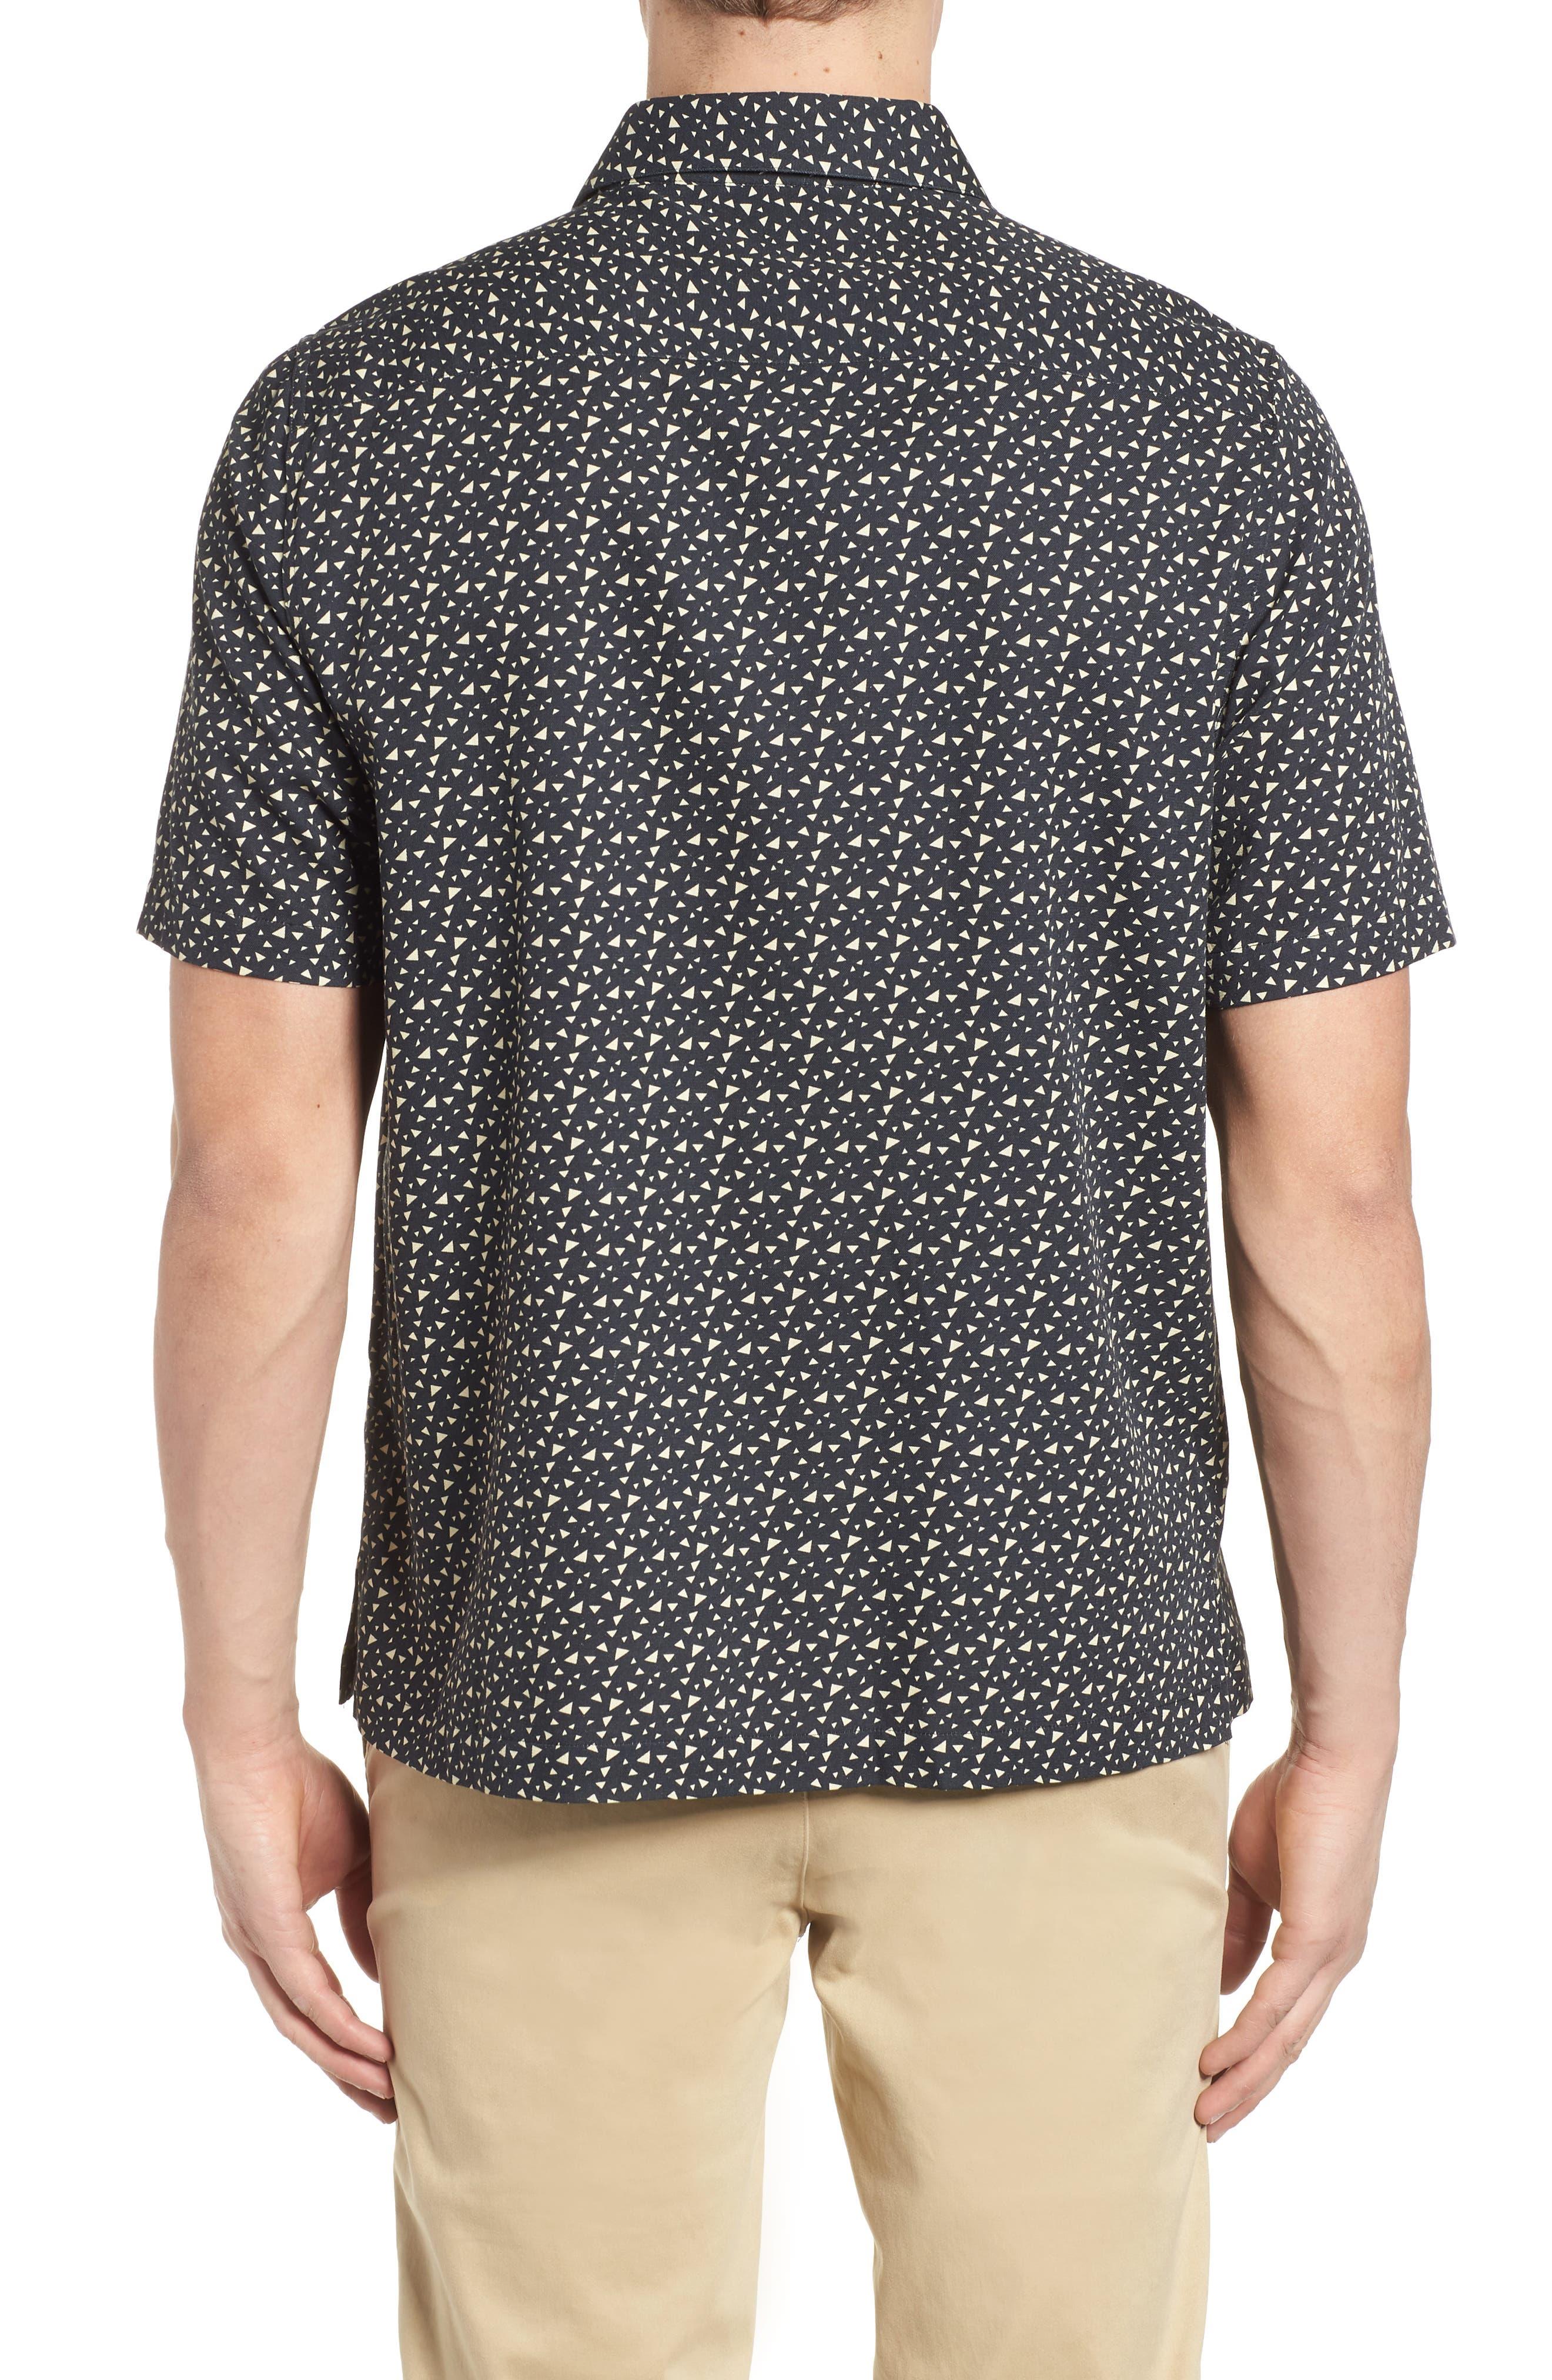 NAT NAST,                             Bermuda Triangle Camp Shirt,                             Alternate thumbnail 2, color,                             001